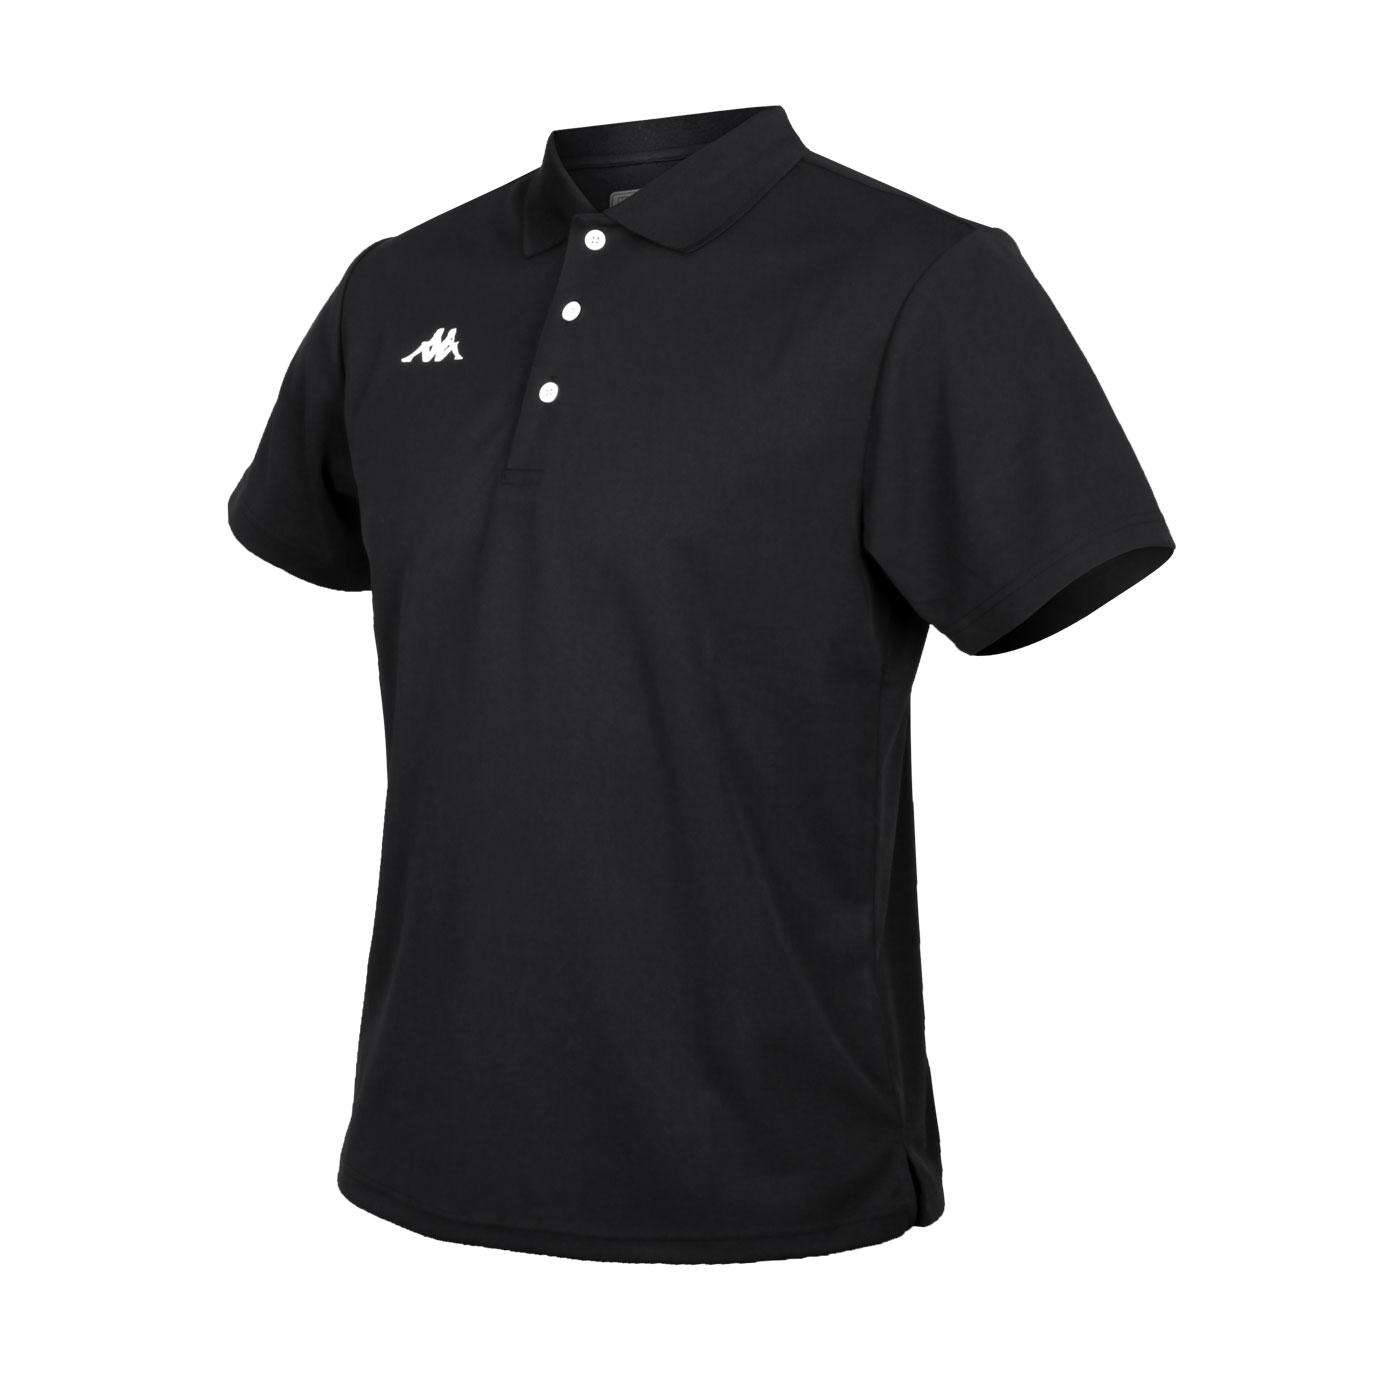 KAPPA 男款K4T短袖POLO衫 321762W-005 - 黑白